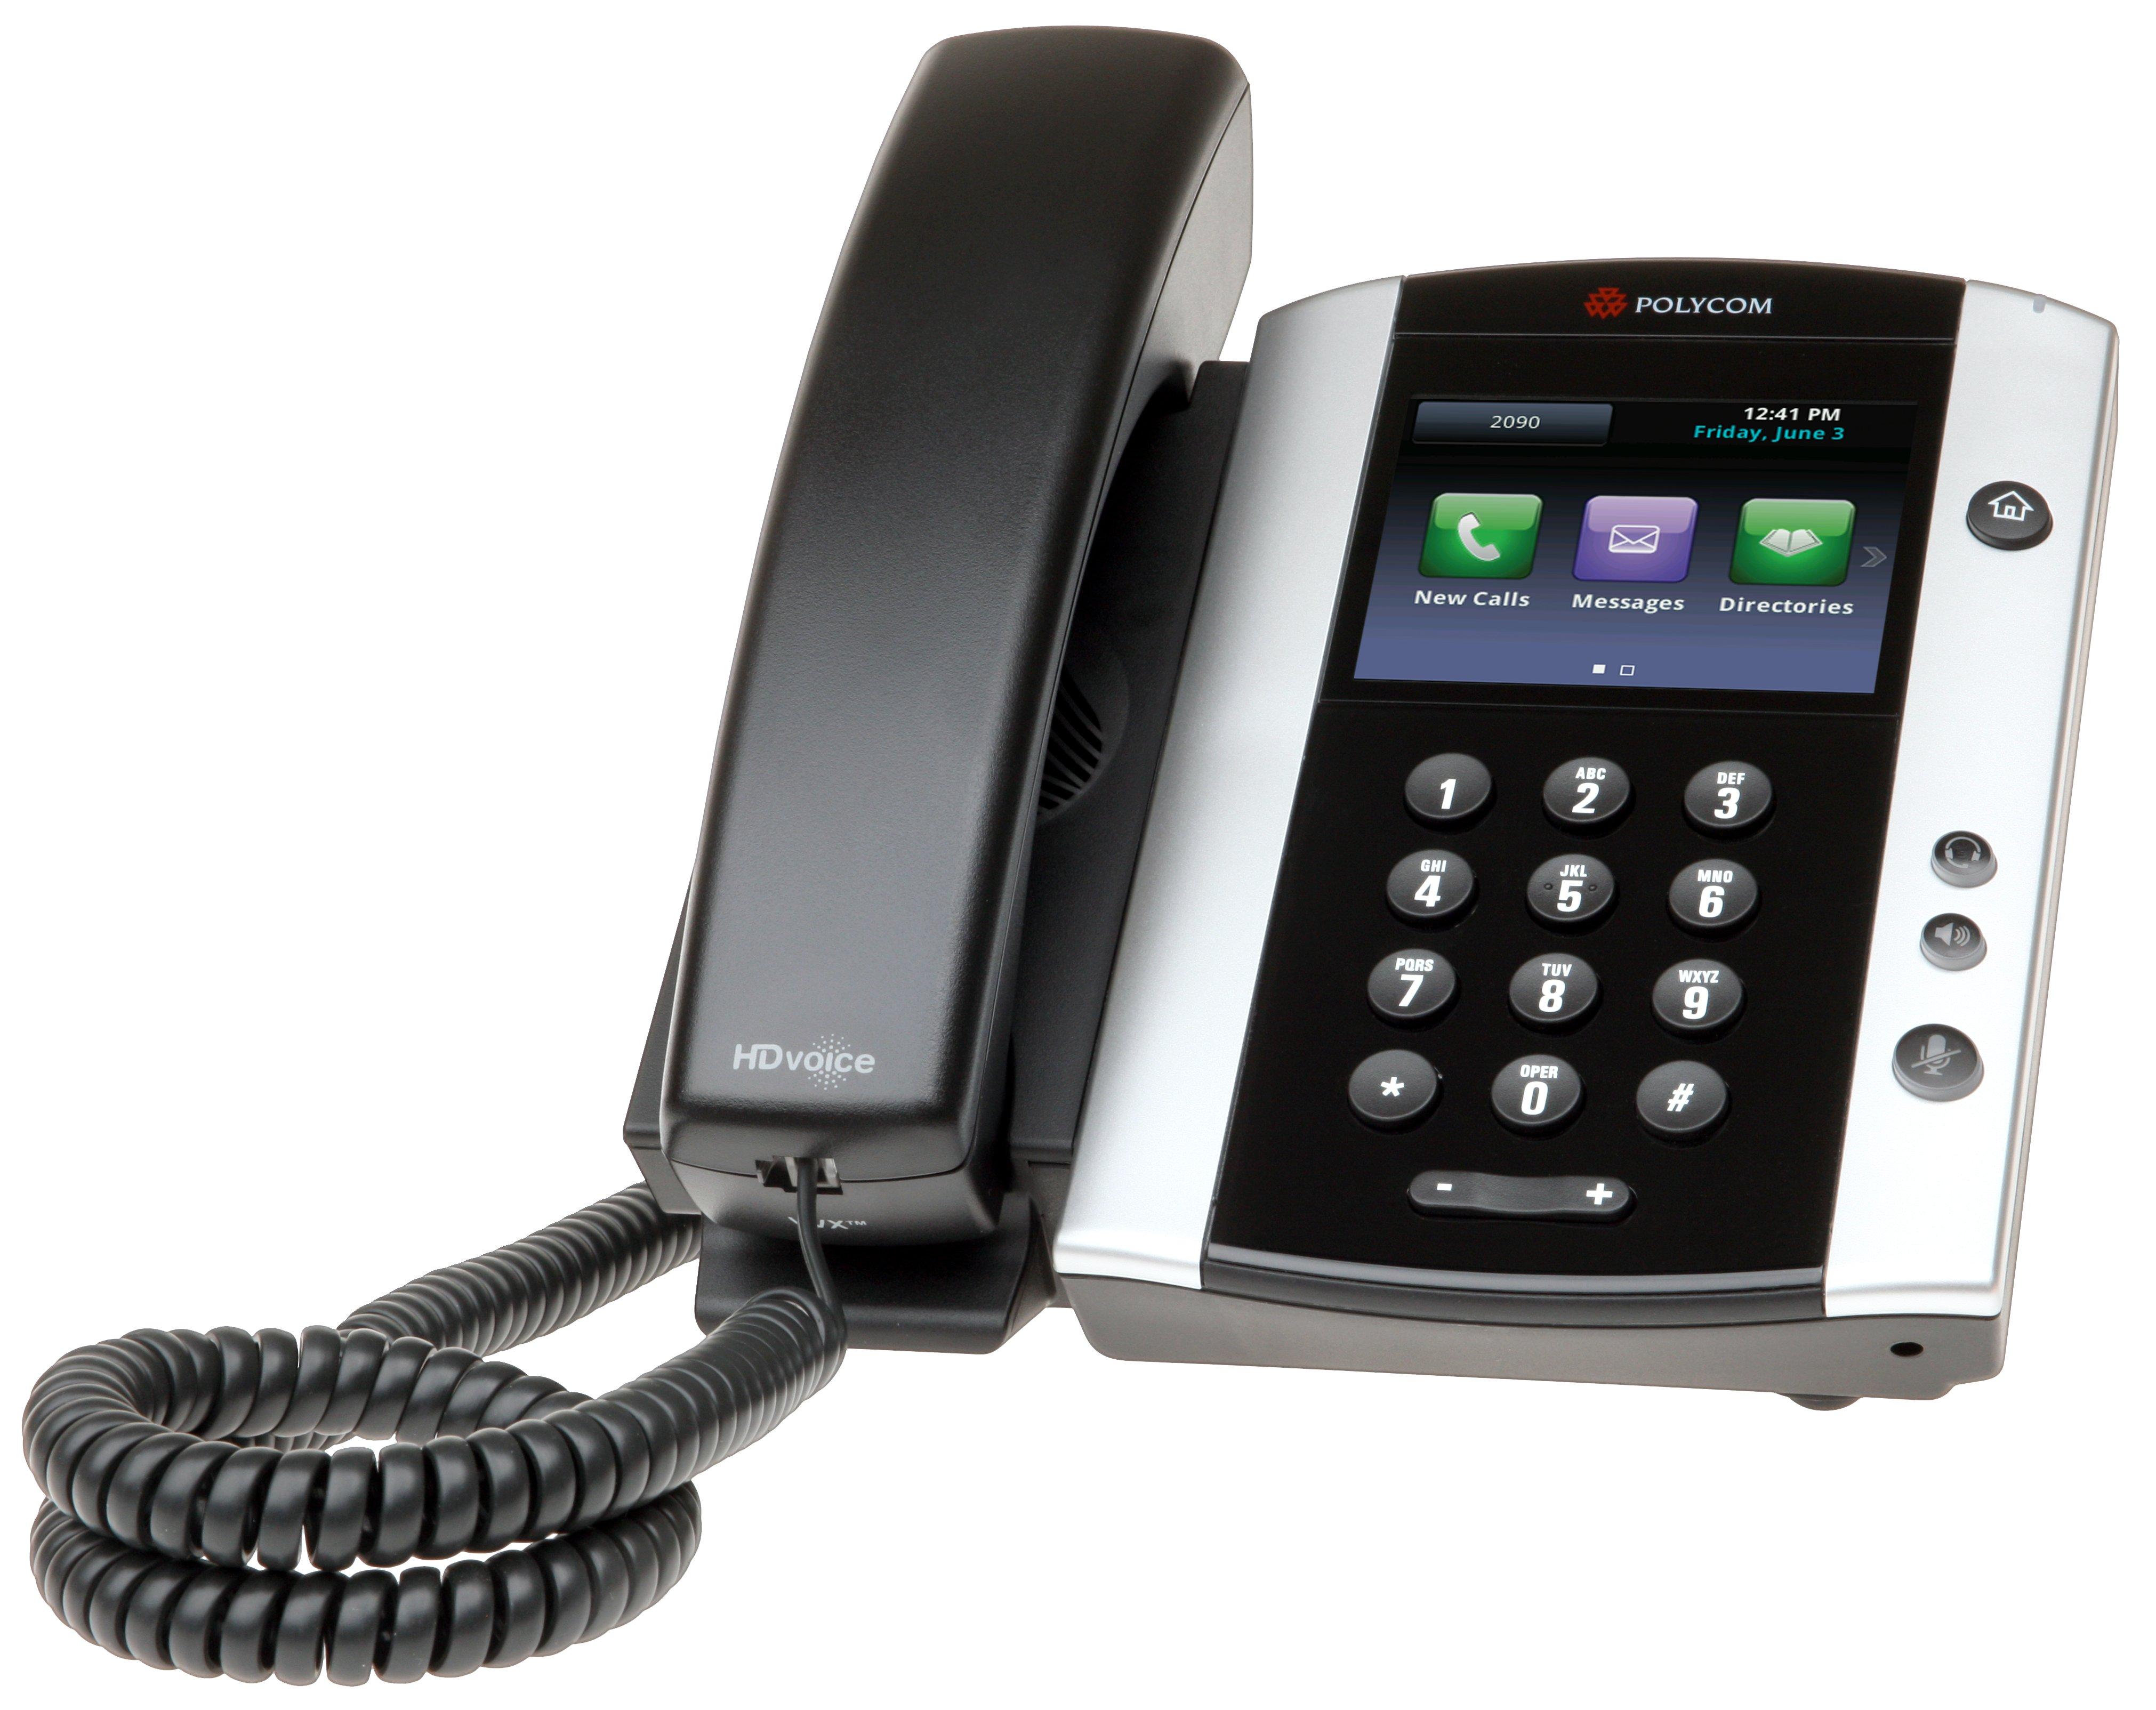 polycom vvx 500 gigabit business media phone vvx500 rh voipon co uk polycom soundpoint ip 330 voip phone manual polycom vvx 500 voip phone manual